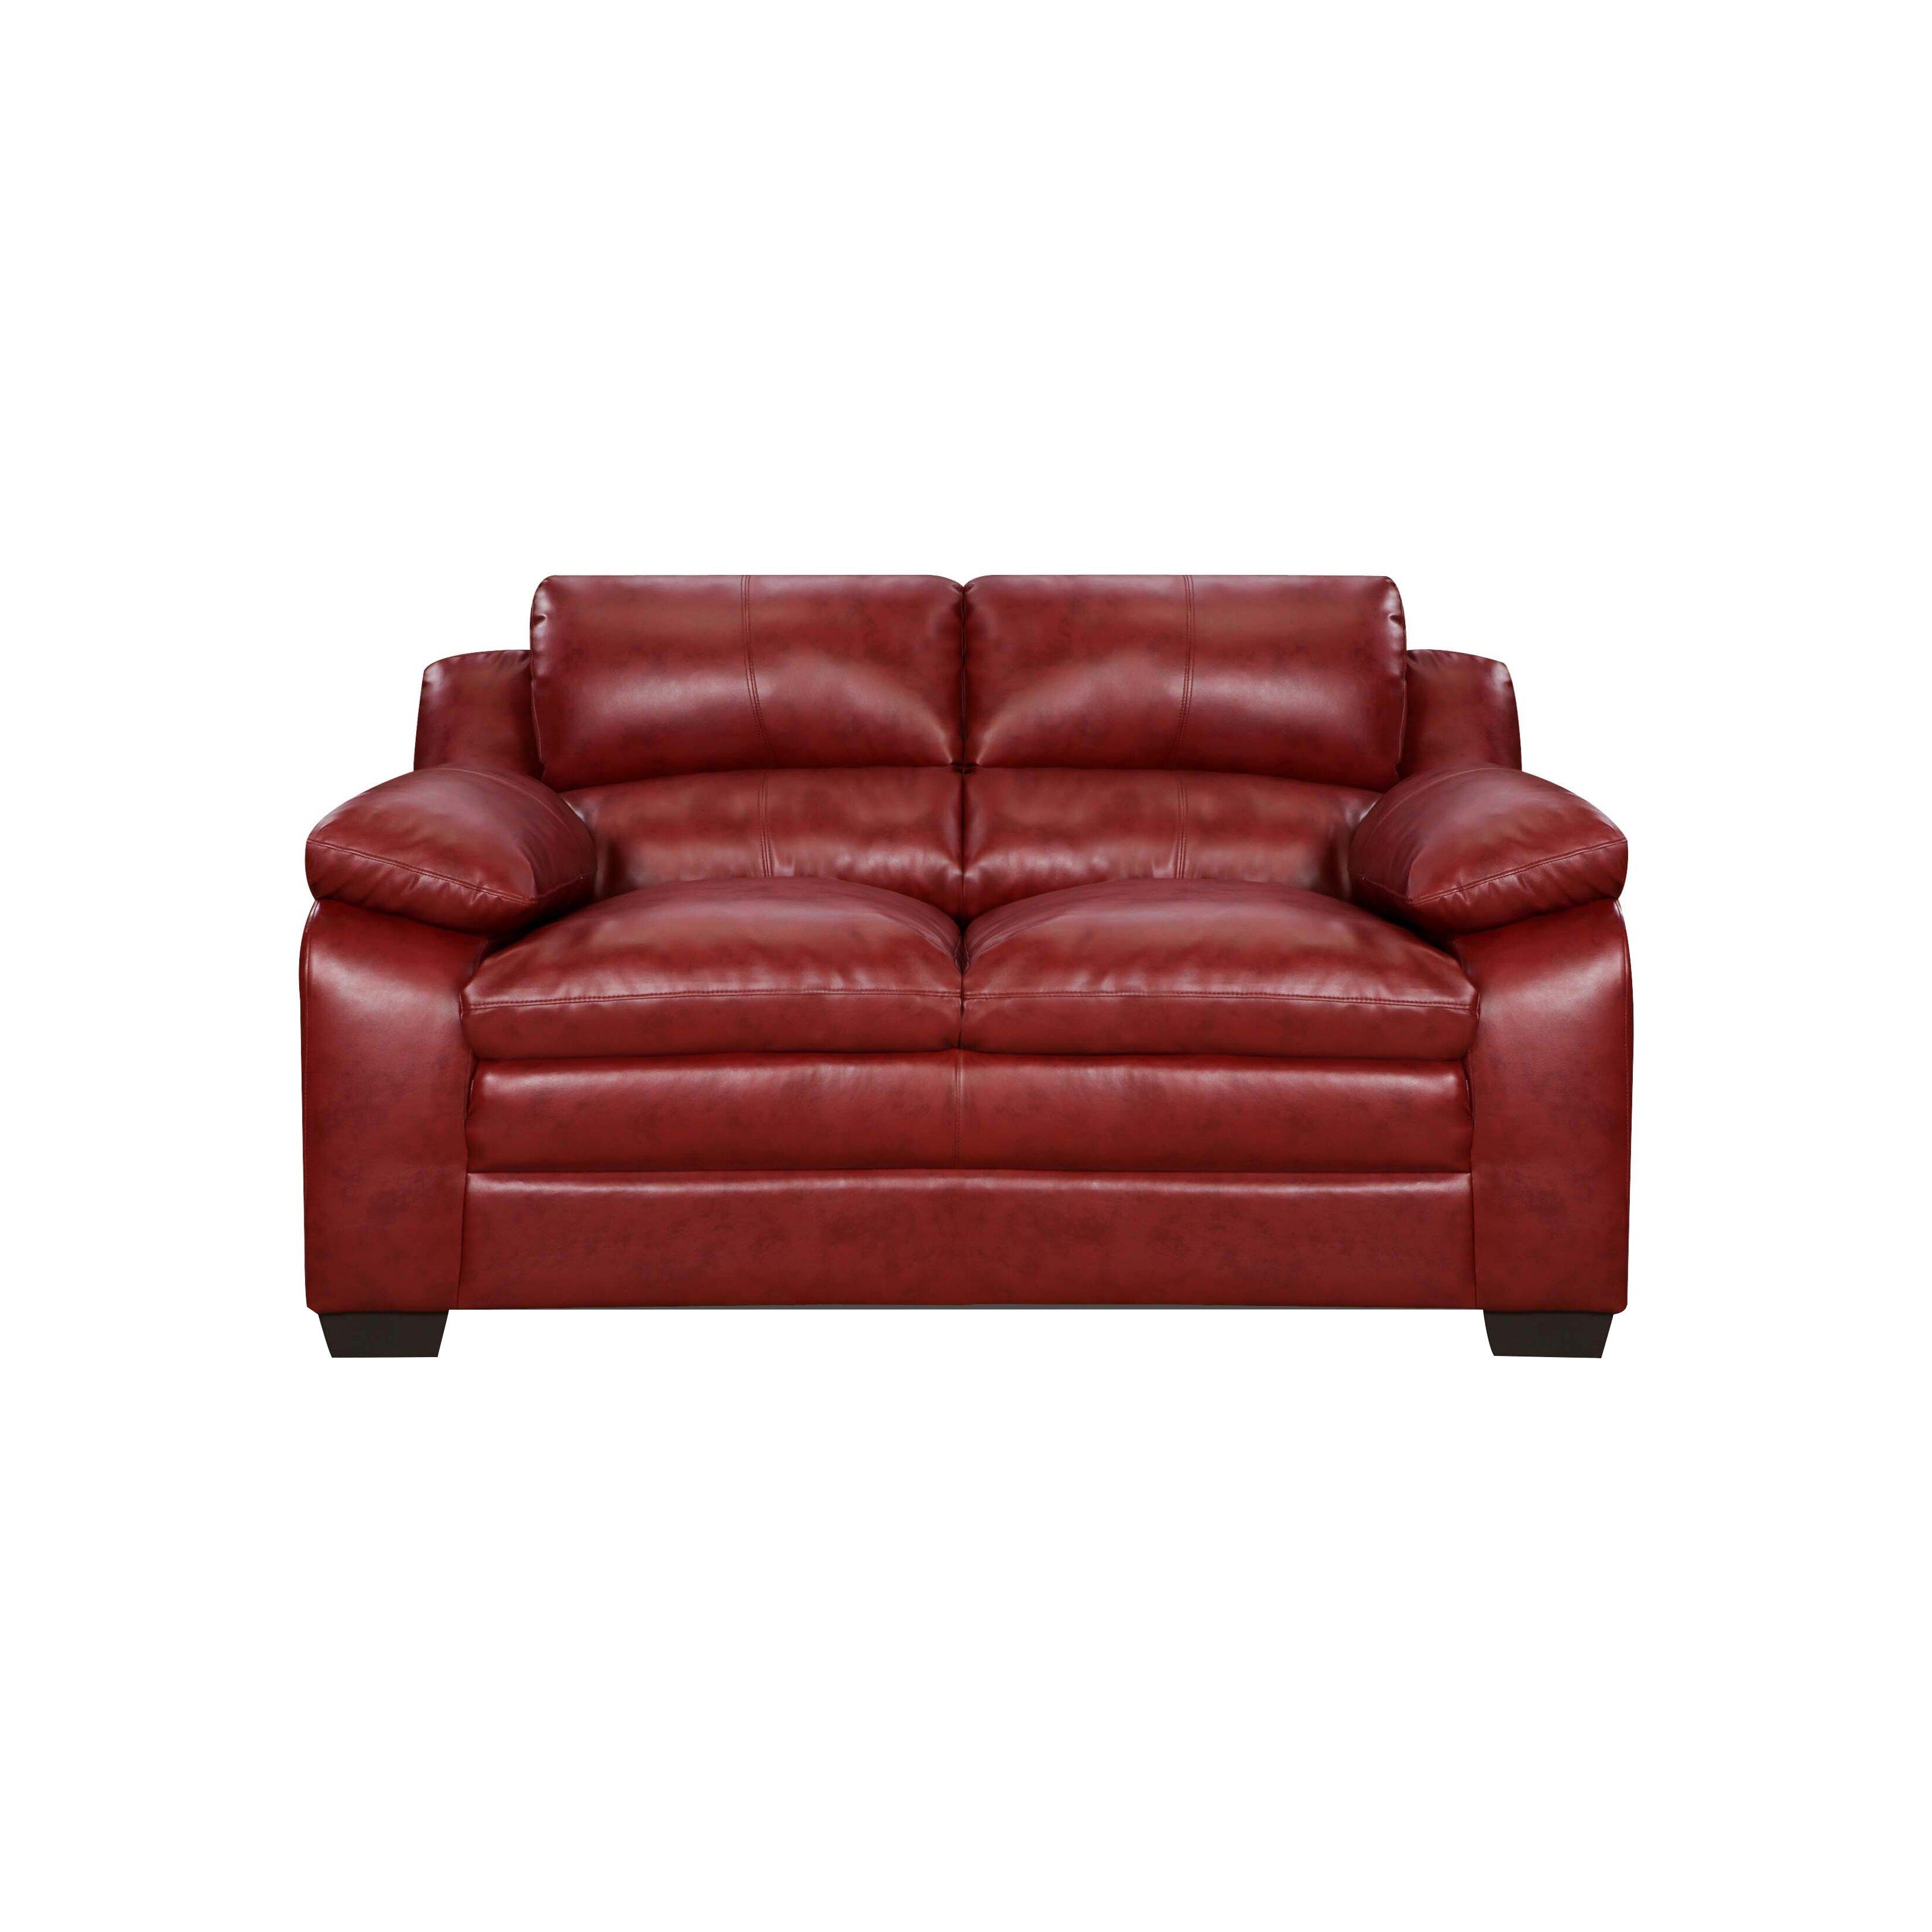 Simmons Upholstery Soho Loveseat Reviews Wayfair